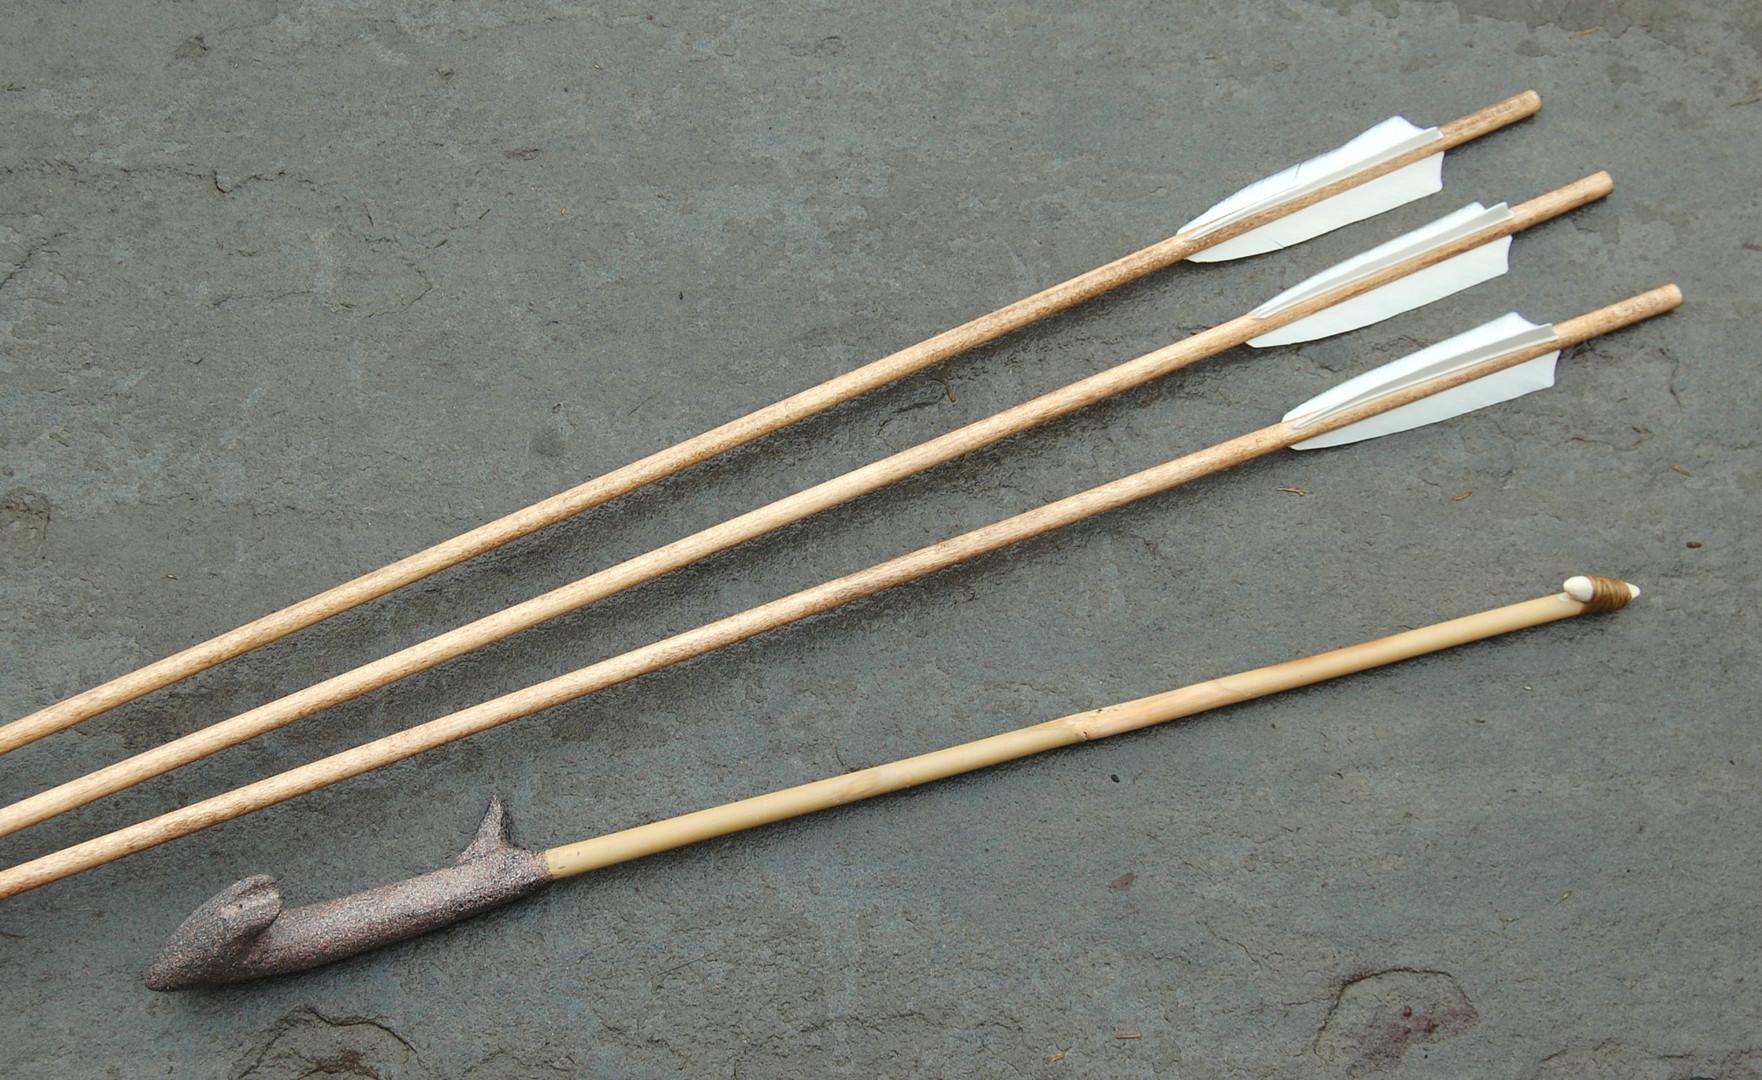 Modern Sport Thrower and Darts